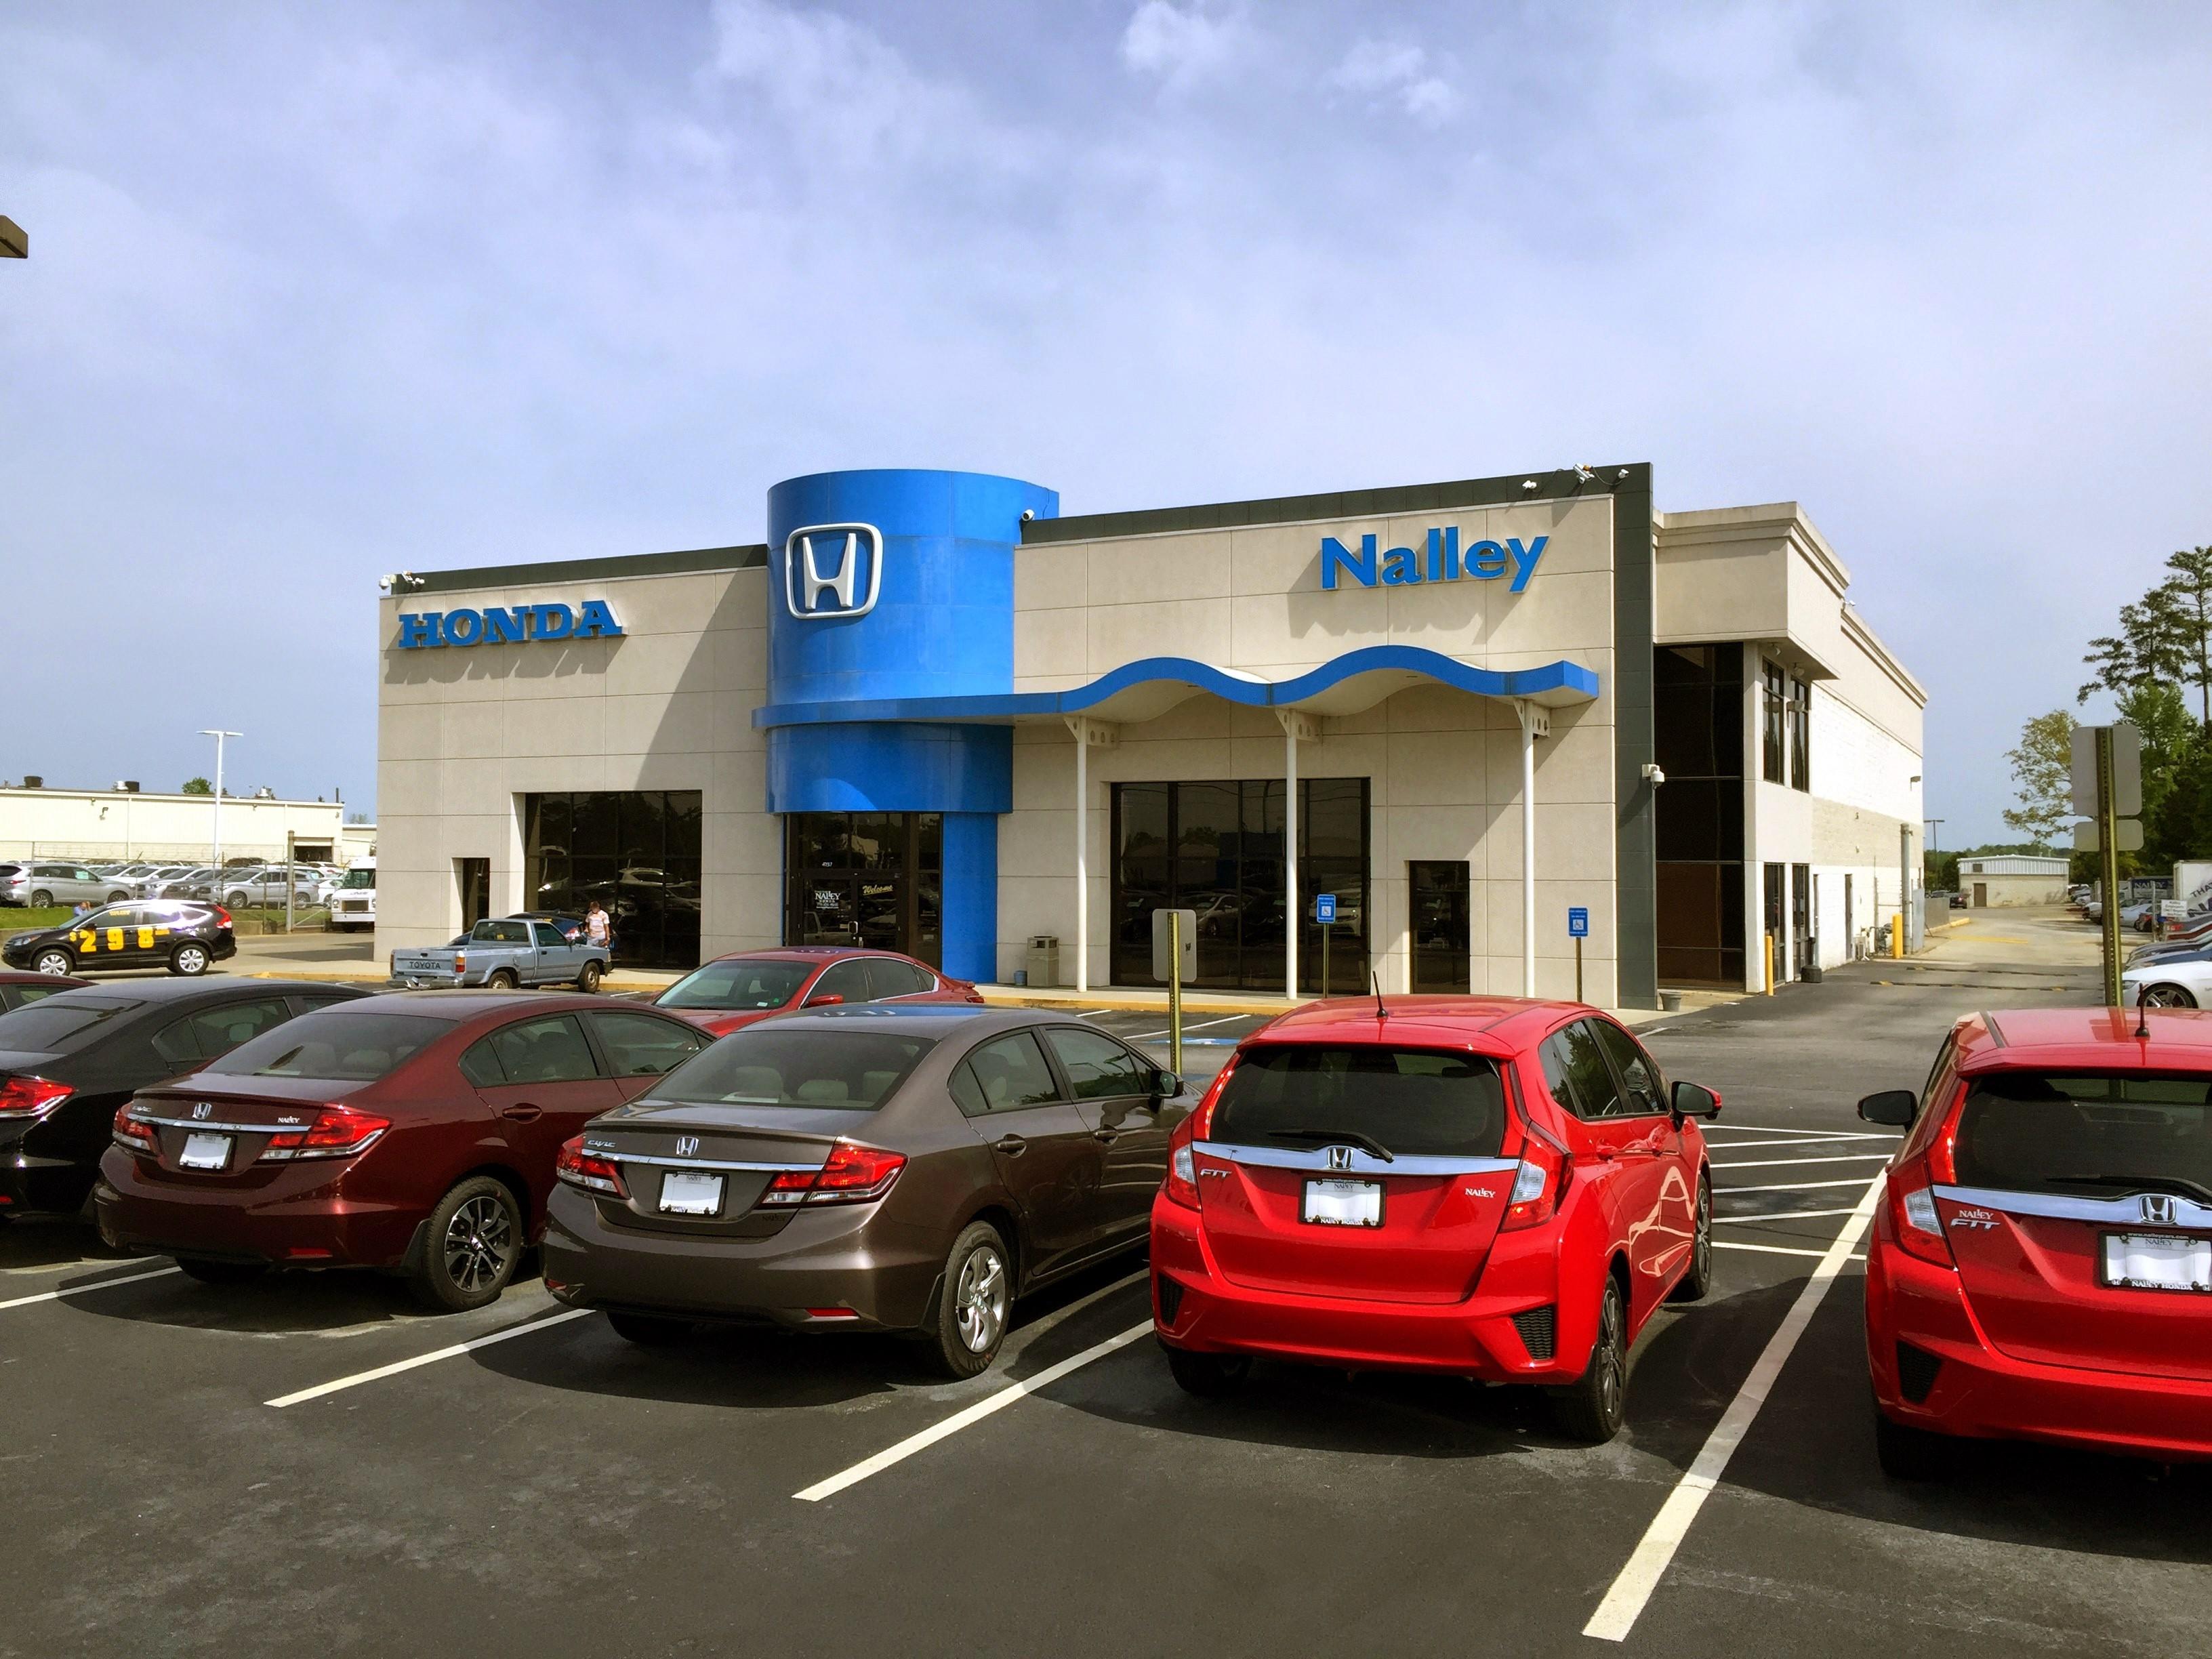 Car Dealerships Brunswick Ga >> Nalley Honda in Union City, GA 30291 - ChamberofCommerce.com